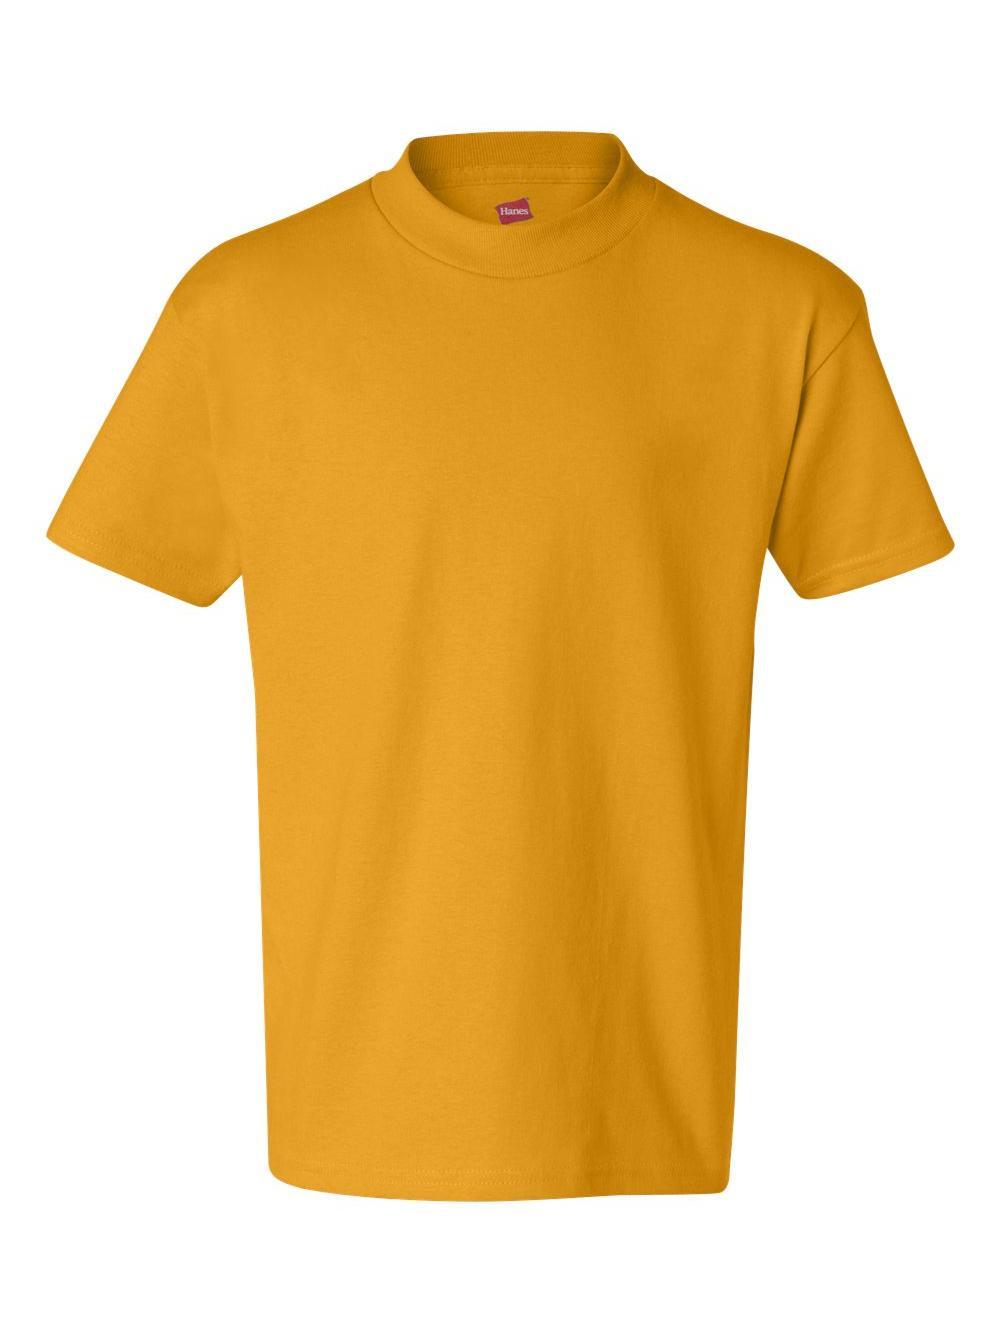 Boys' Tagless Short Sleeve T-Shirt